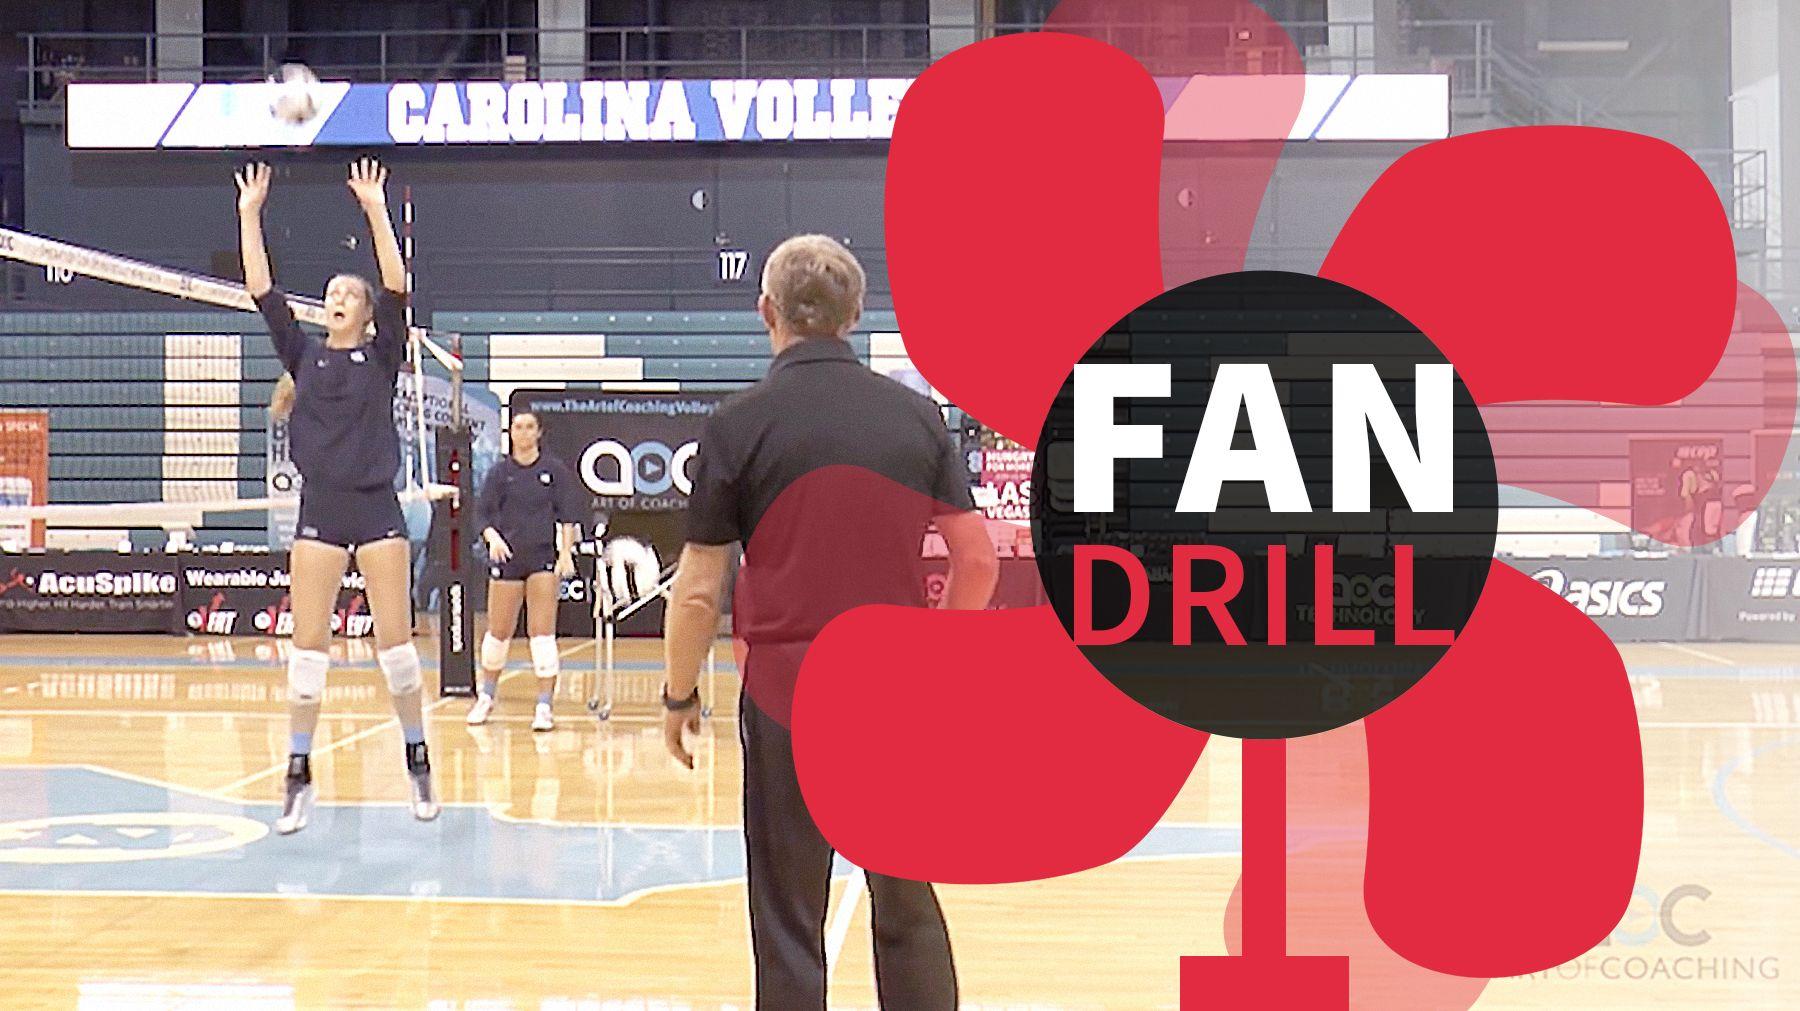 Setting Basics The Fan Drill The Art Of Coaching Volleyball Coaching Volleyball Volleyball Practice Volleyball Skills